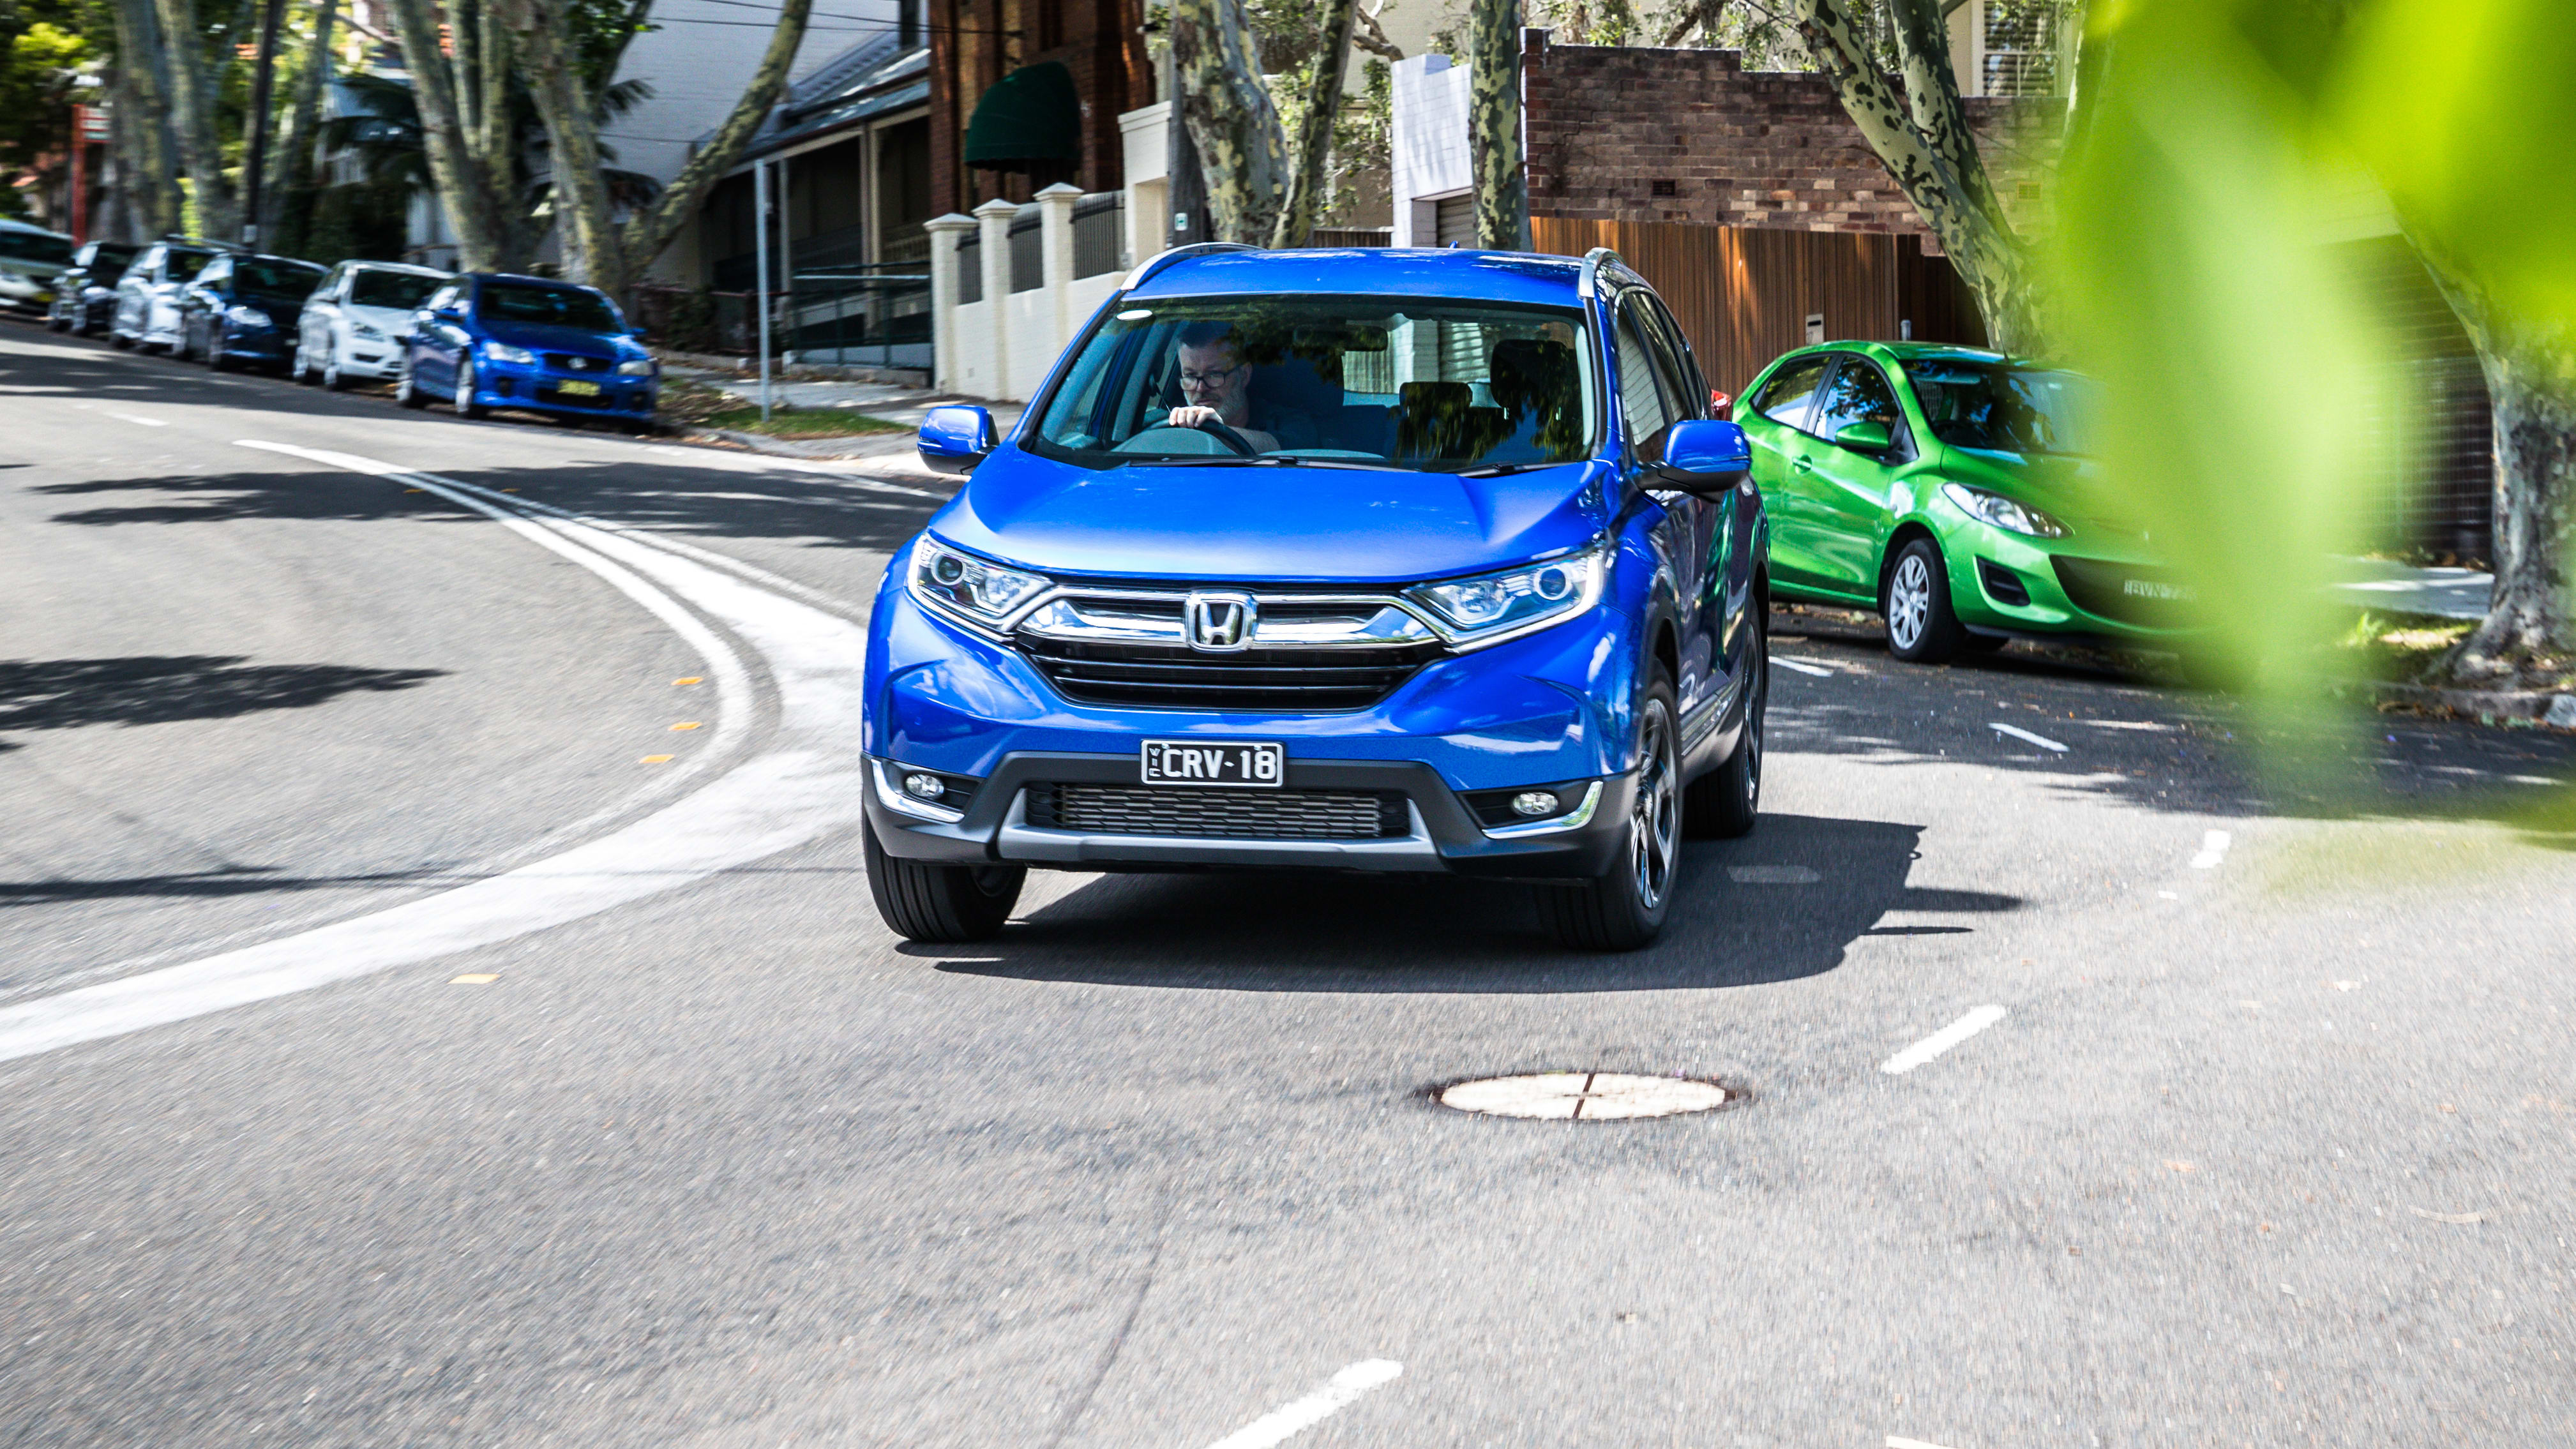 2019 Honda CR-V VTi-S AWD long-term review: Wrap-up | CarAdvice